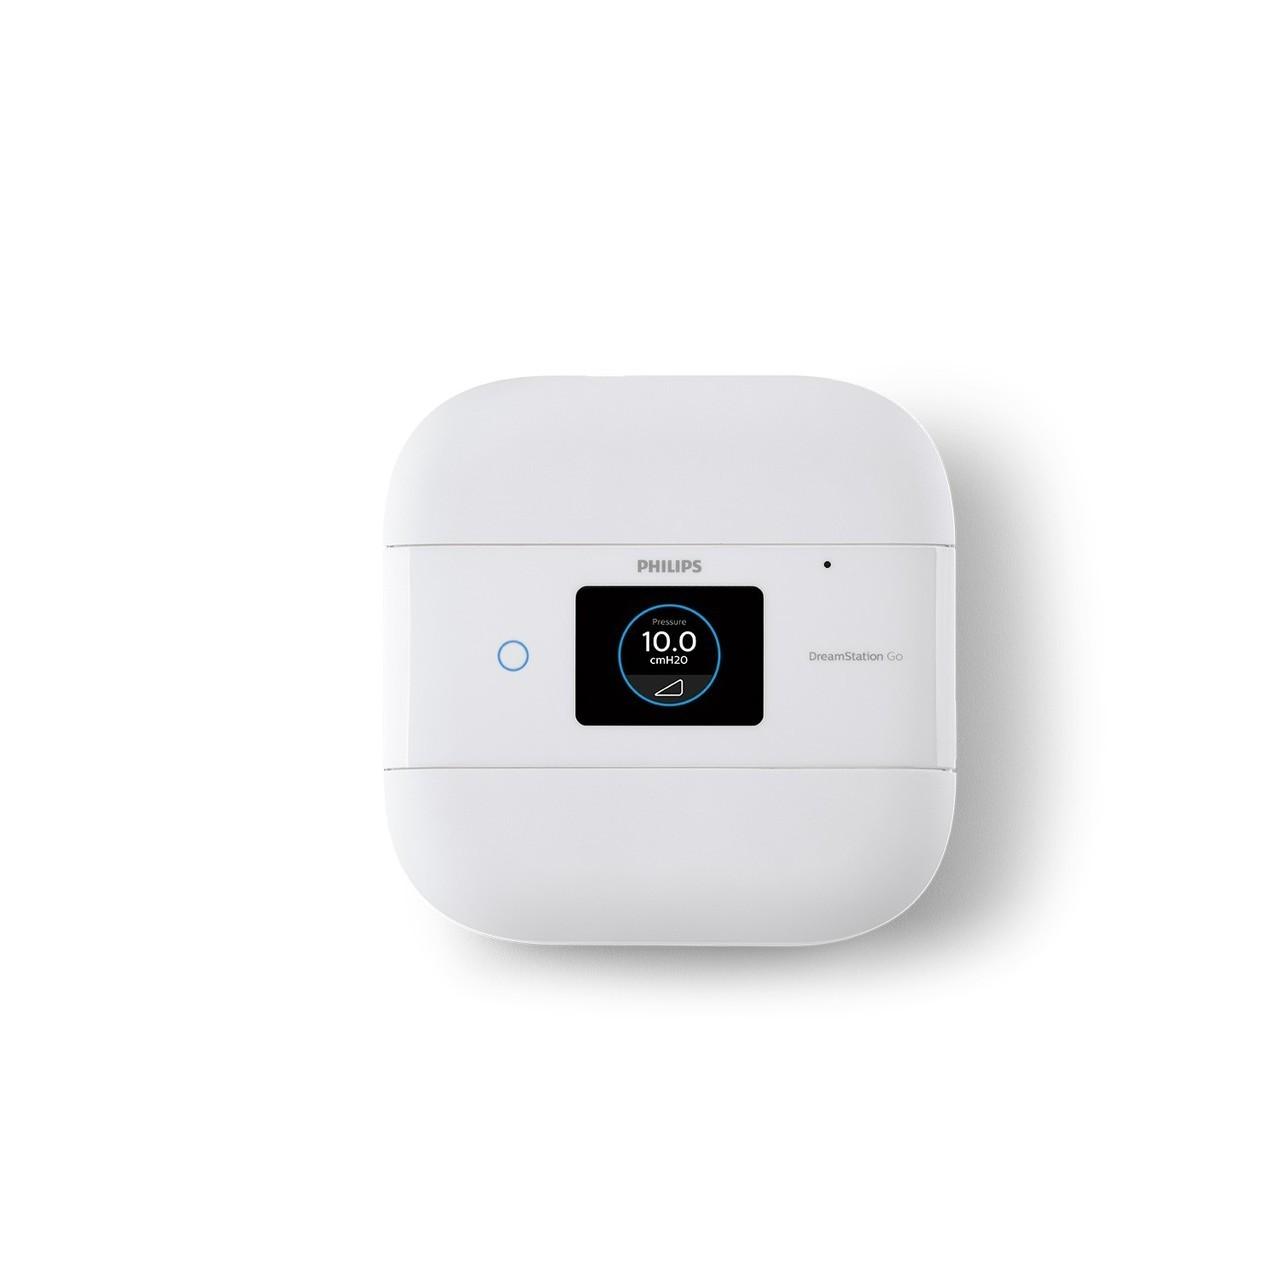 Dispozitiv CPAP Philips Respironics DreamStation Go Auto